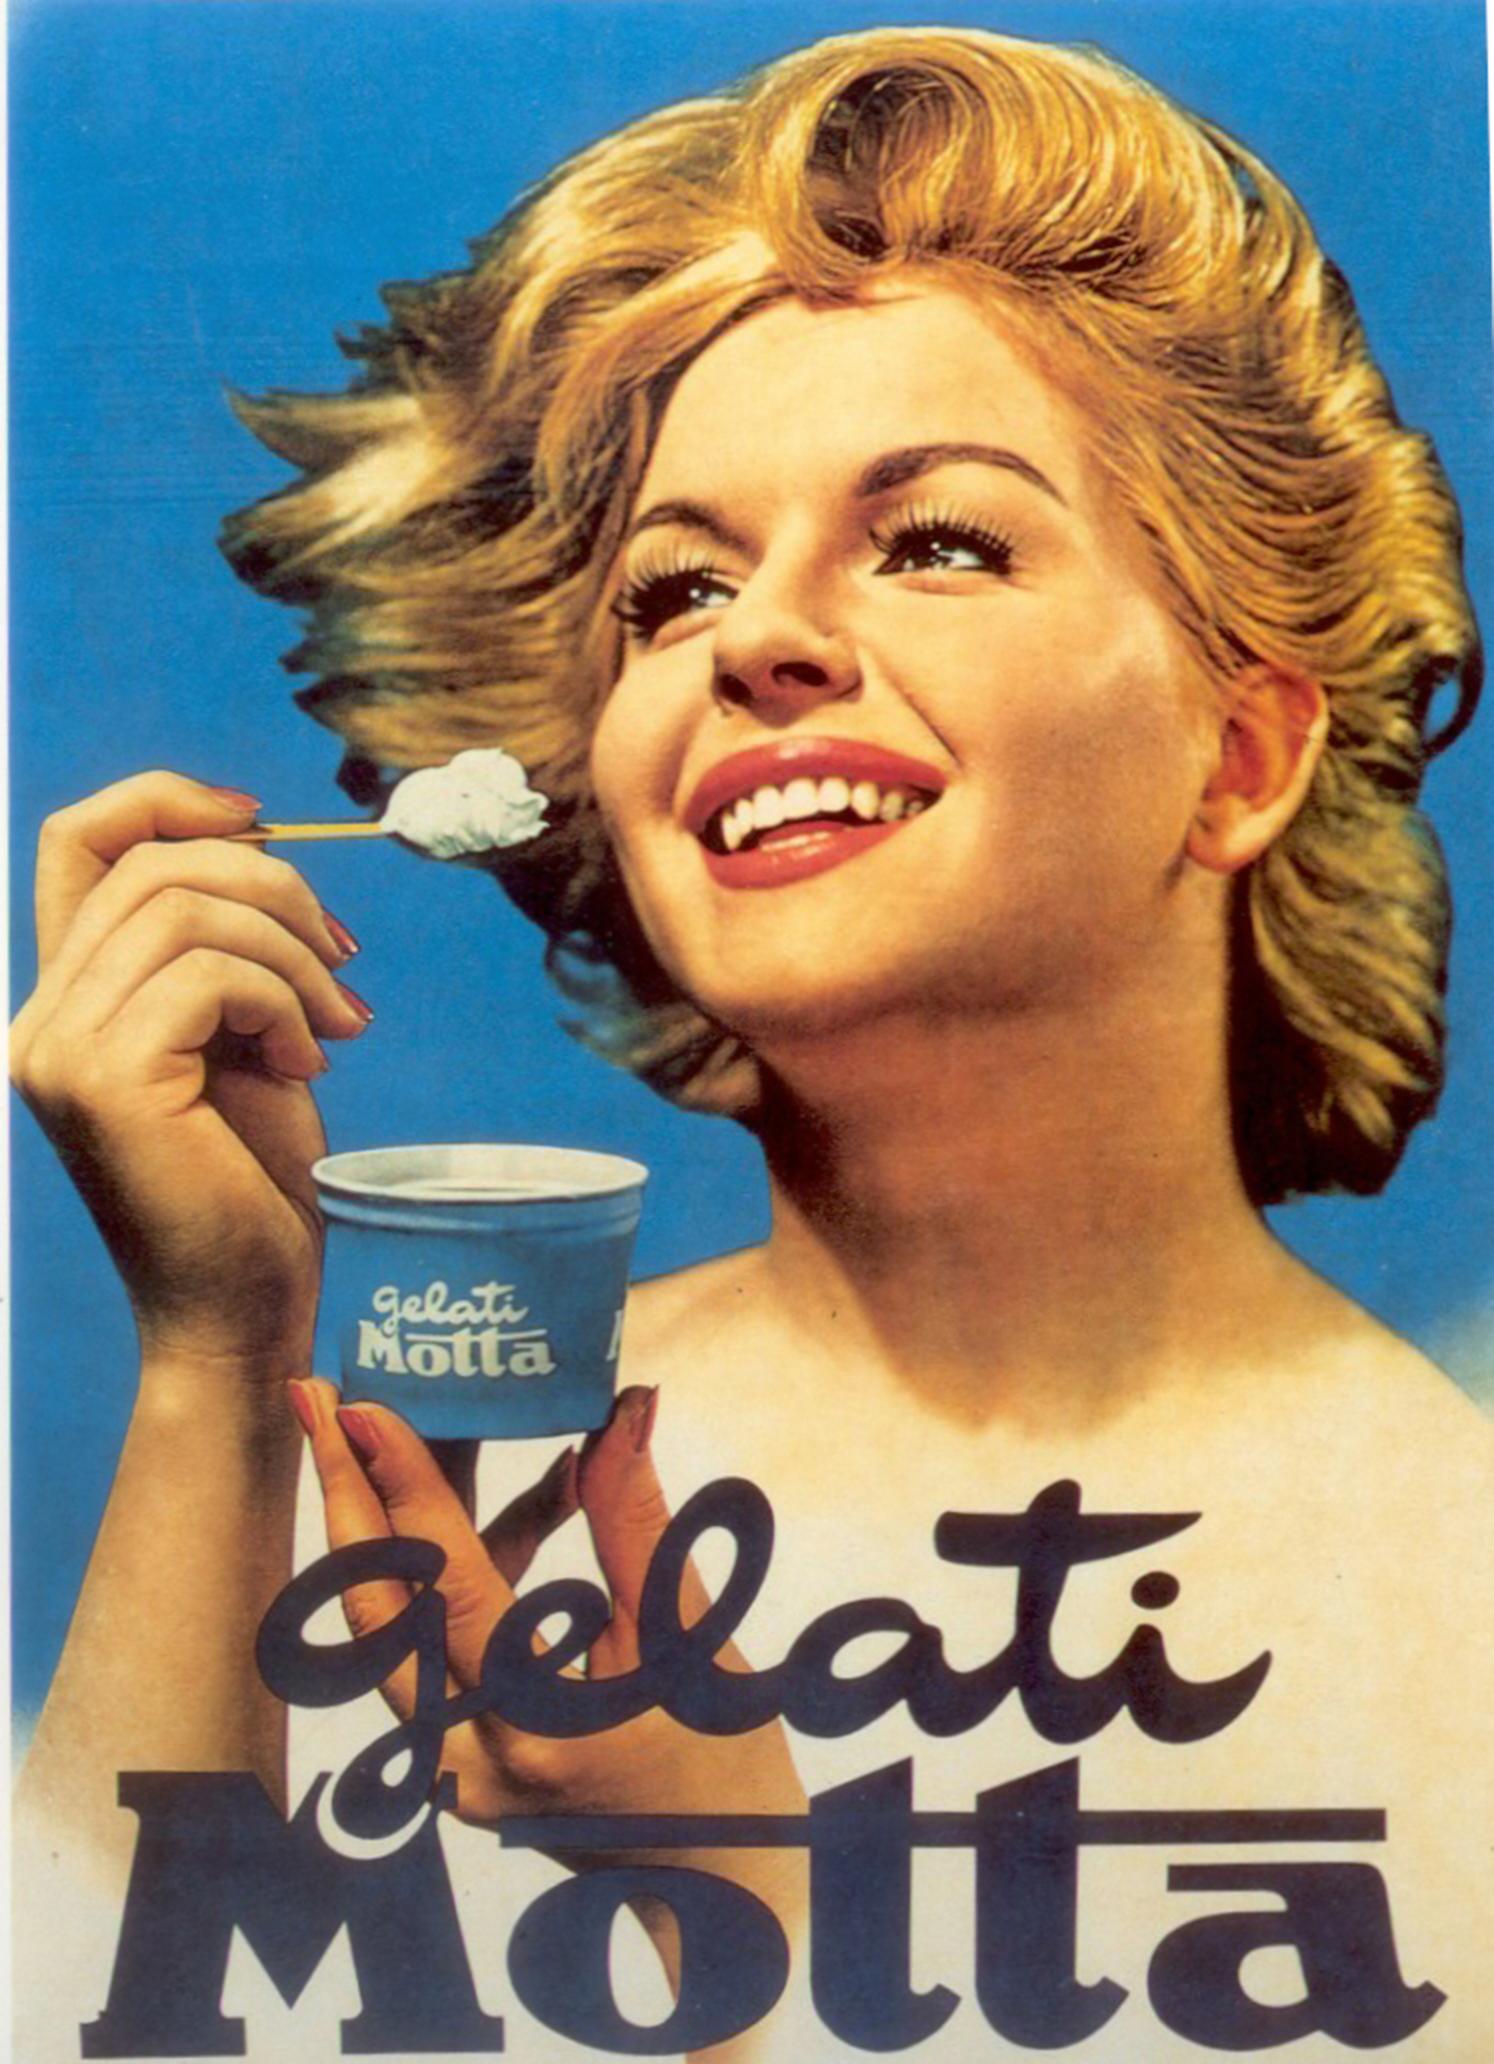 gelati-Motta-italiano-cucchiaino-coppetta